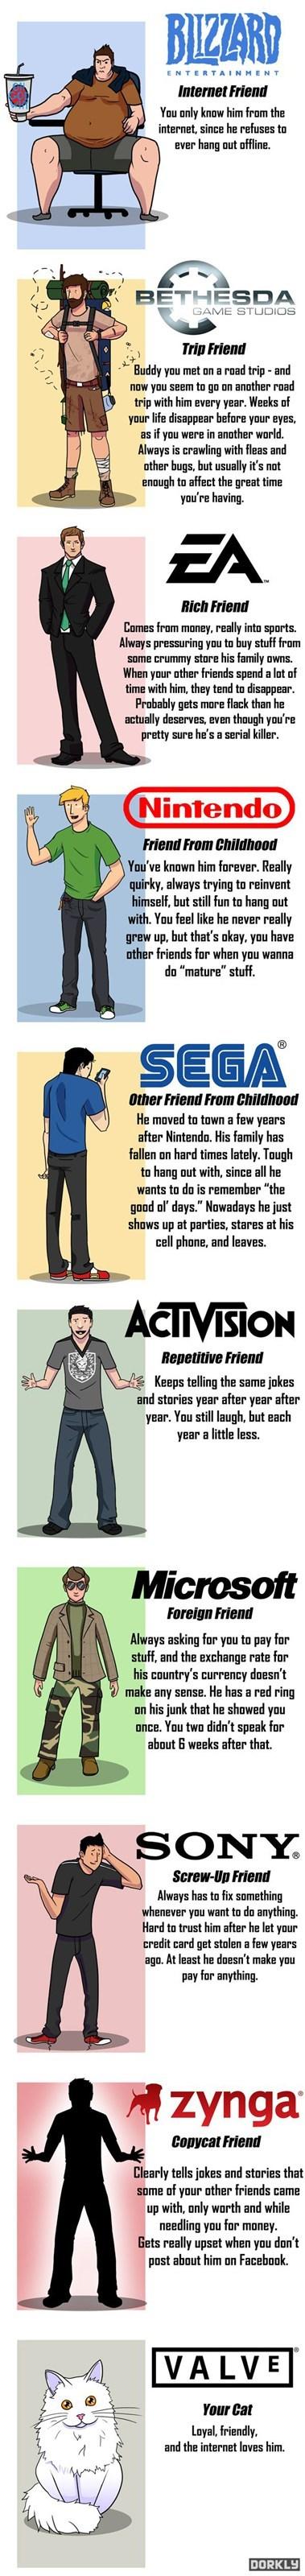 dorkly comic video game companies - 7039479808